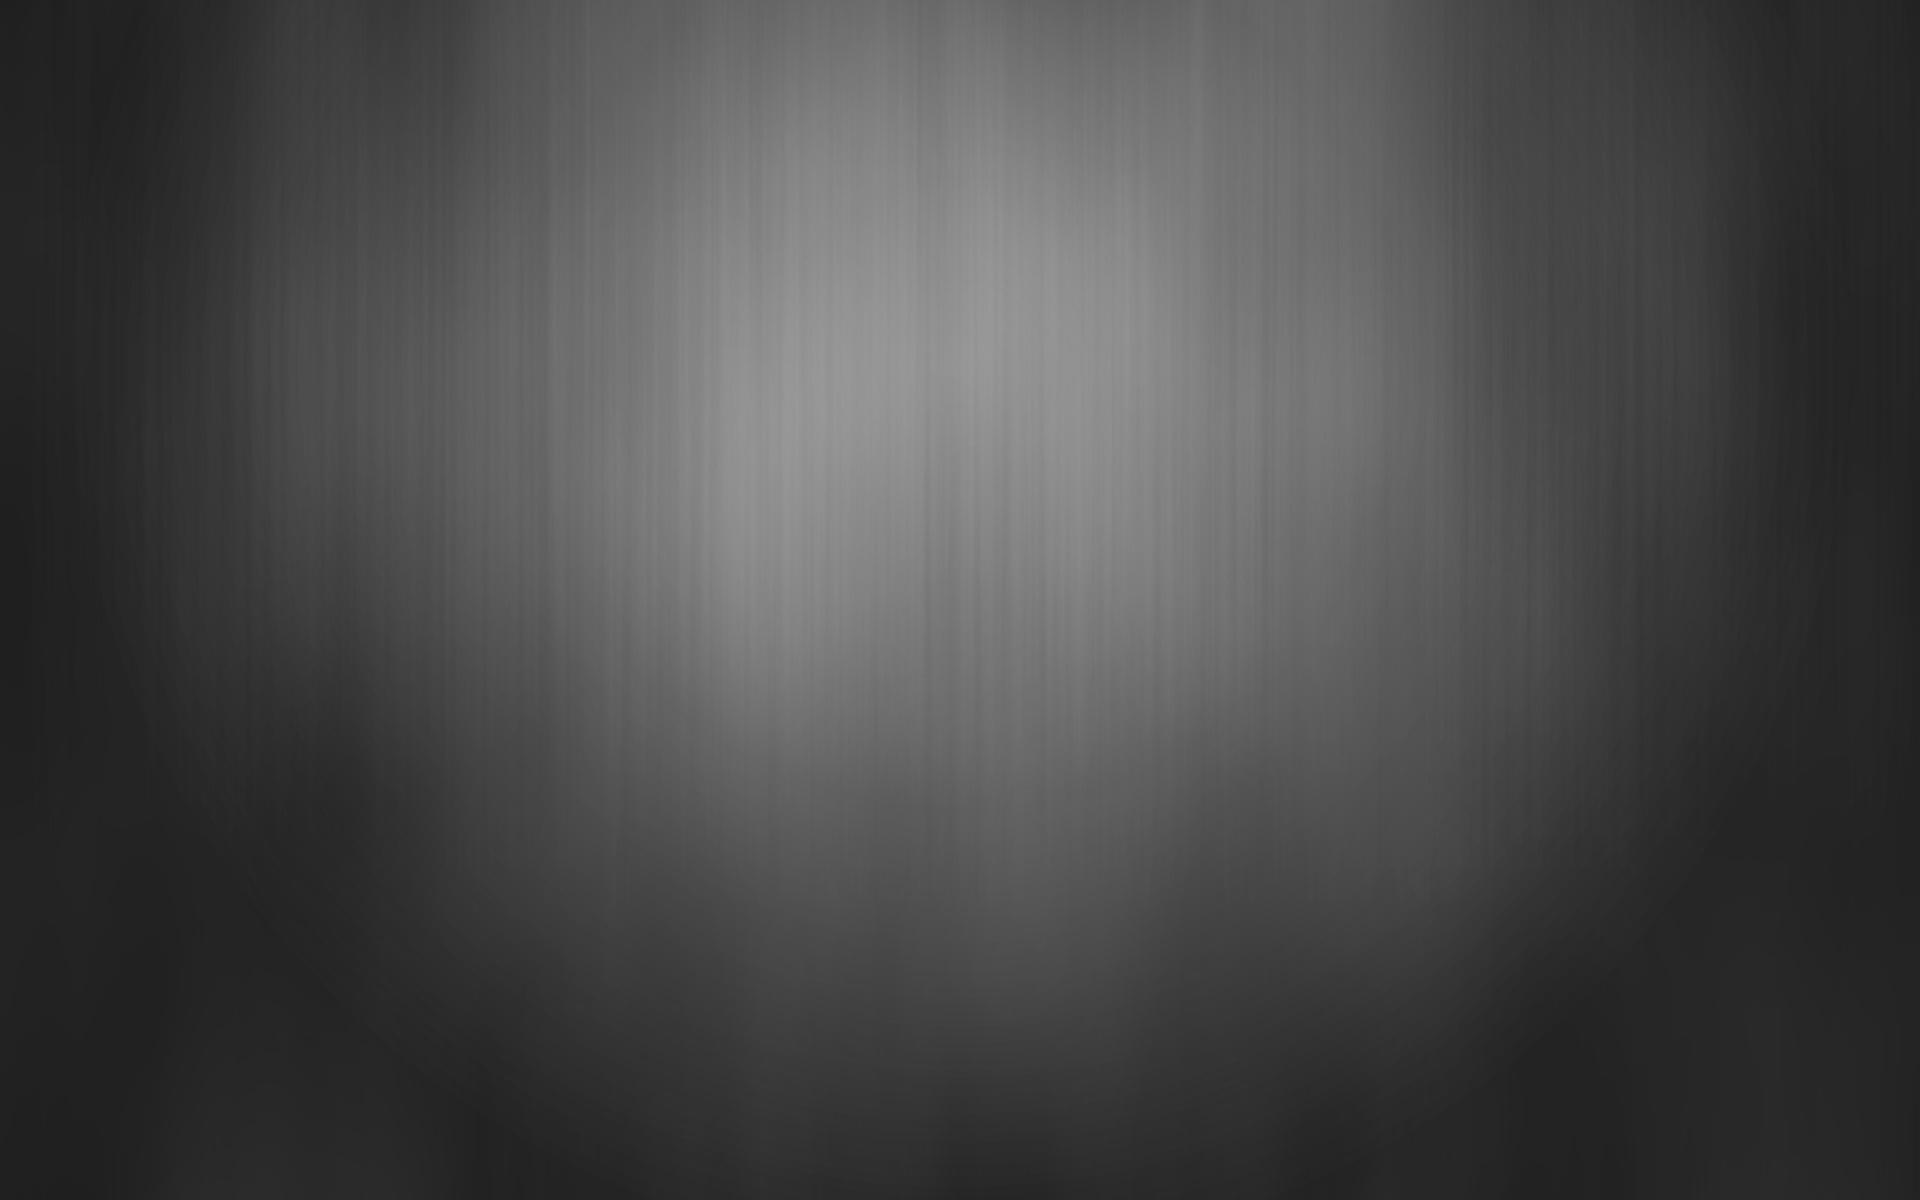 Flat Black   Cool Twitter Backgrounds 1920x1200